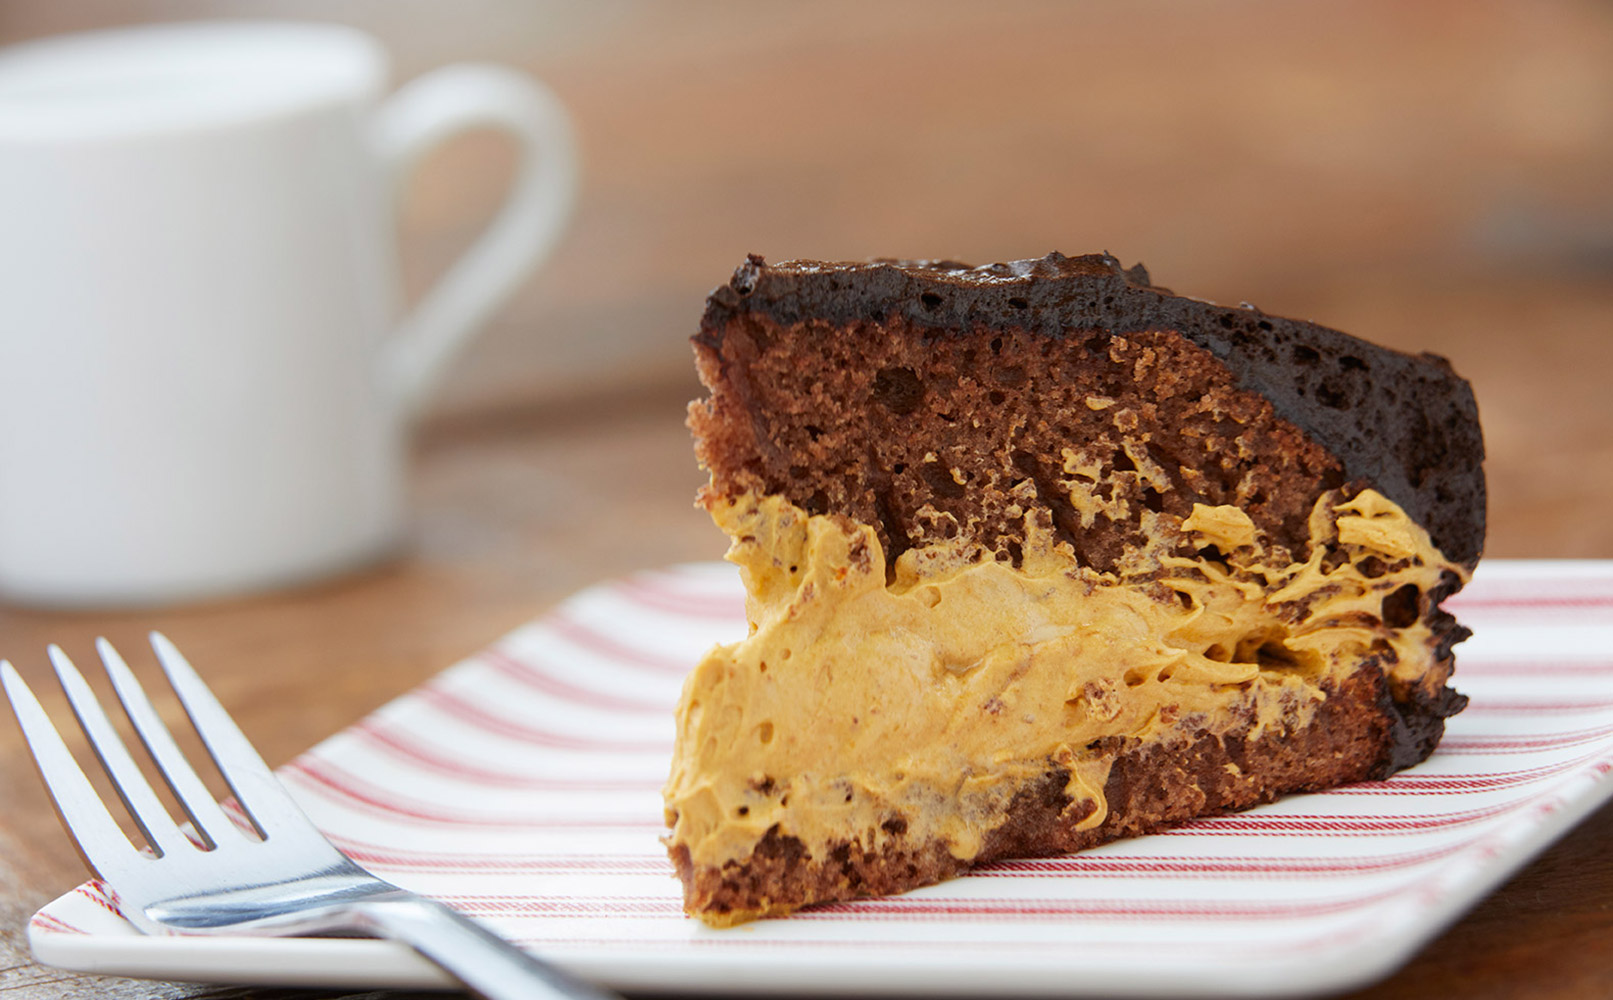 Salted Caramel and Dark Chocolate Patriotic Cake